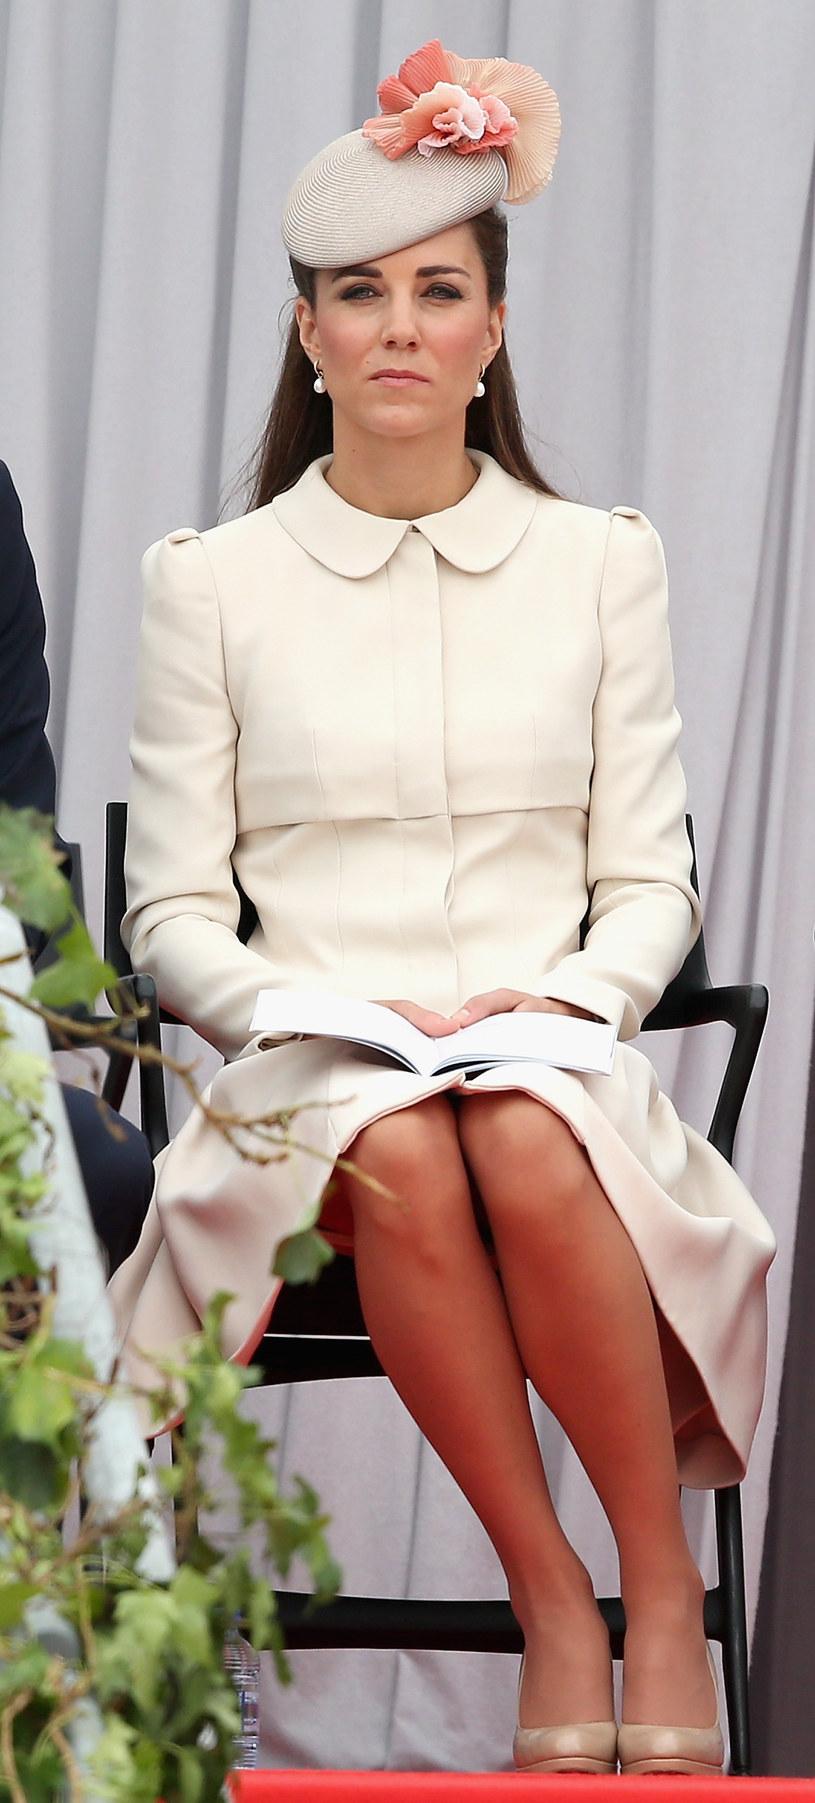 Księżna Kate Middleton nadal nie czuje się najlepiej /Chris Jackson /Getty Images